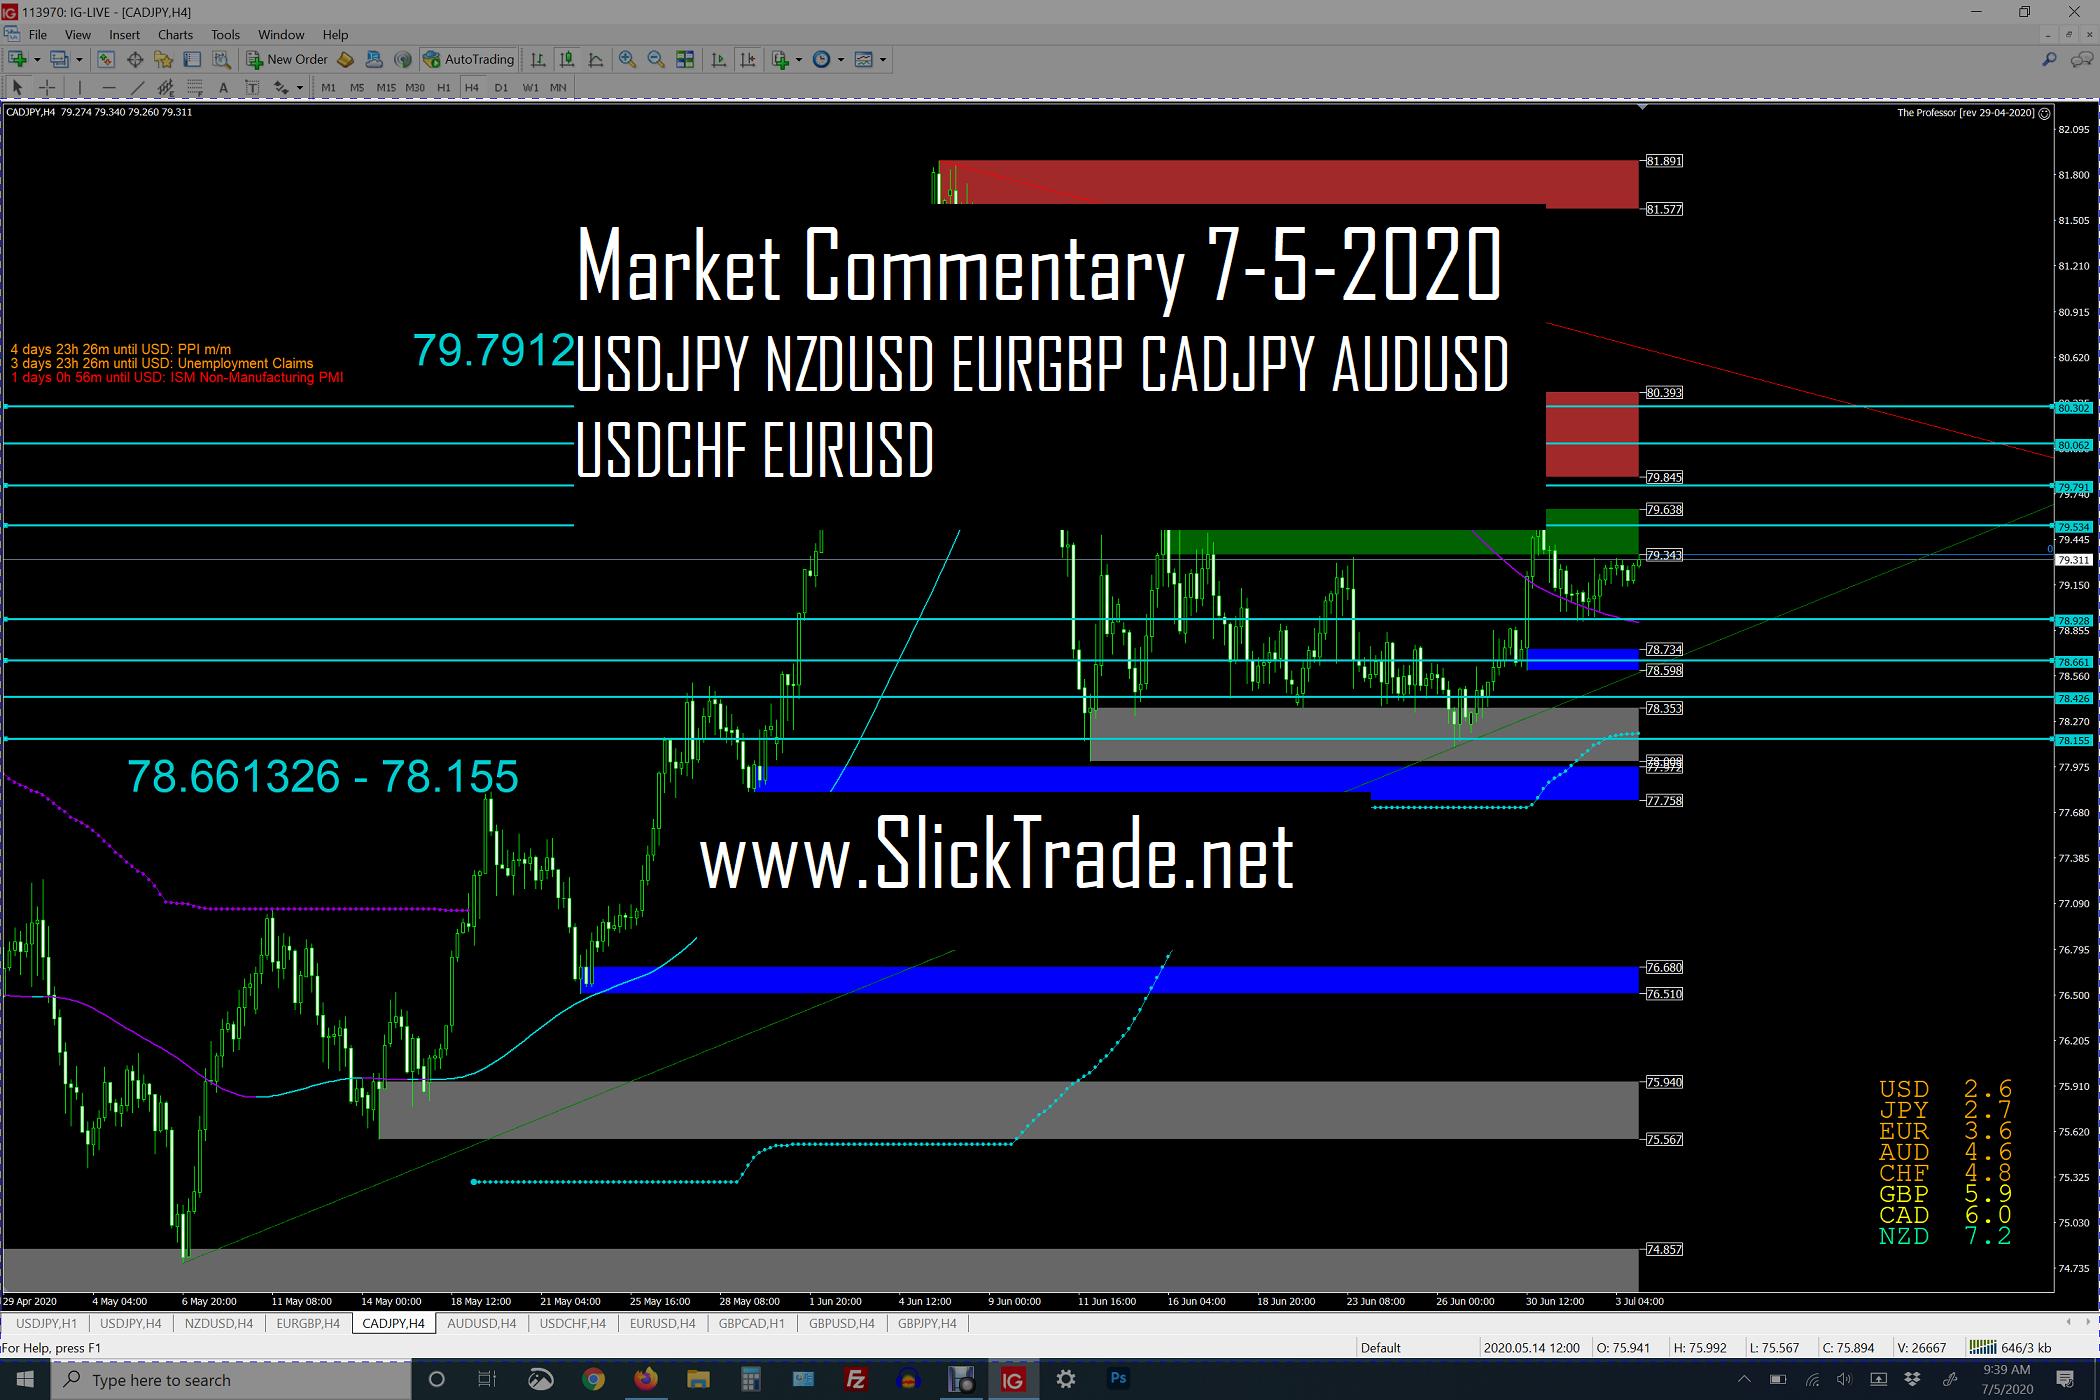 Market Commentary 7-5-2020 - USDJPY NZDUSD EURGBP CADJPY AUDUSD USDCHF EURUSD